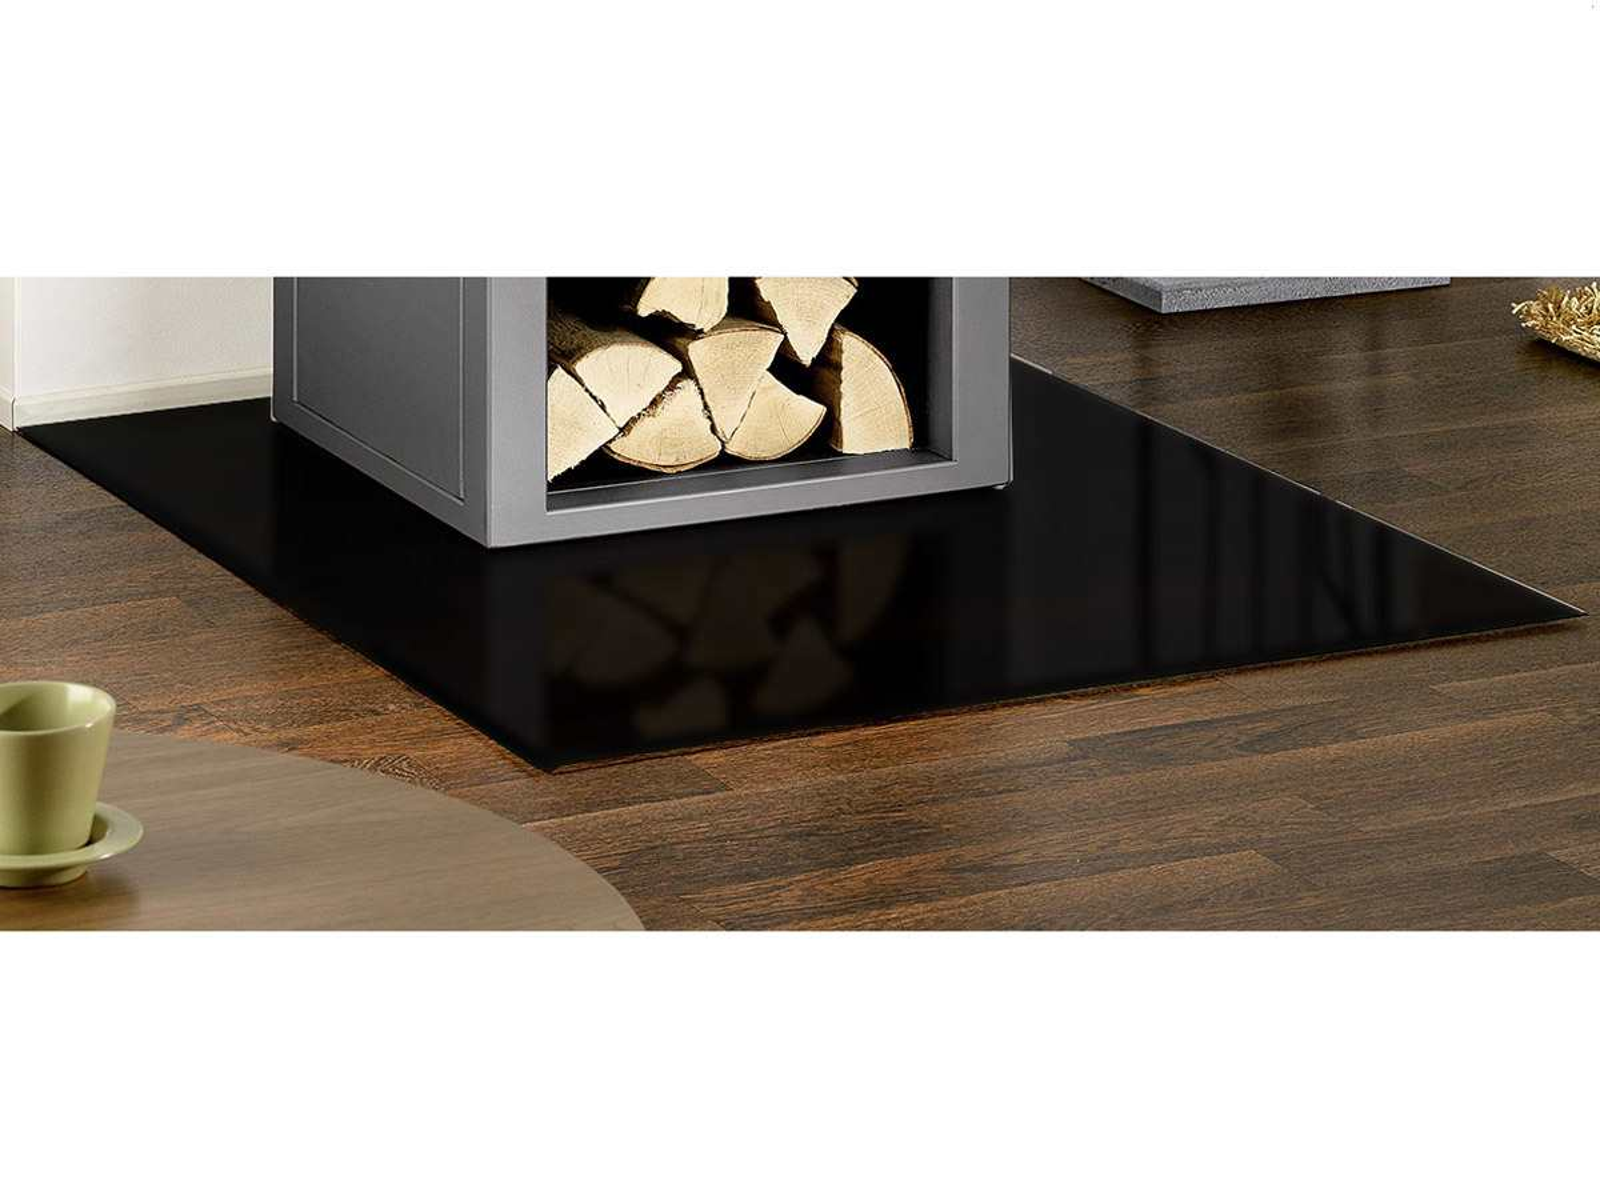 oranier bodenplatte stahl schwarz b1 rechteck 9201 50. Black Bedroom Furniture Sets. Home Design Ideas